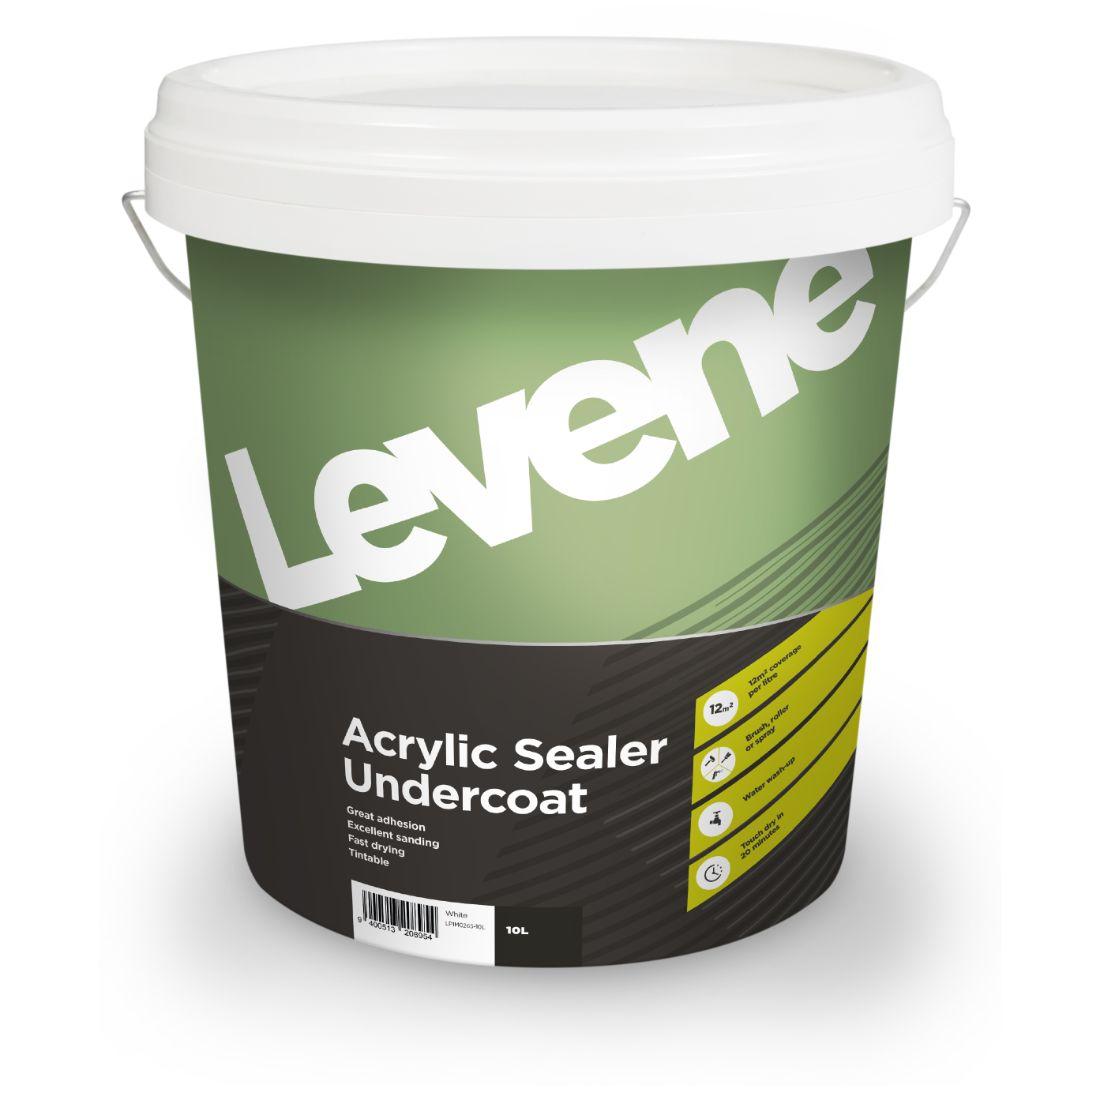 Acrylic Sealer Undercoat 10L